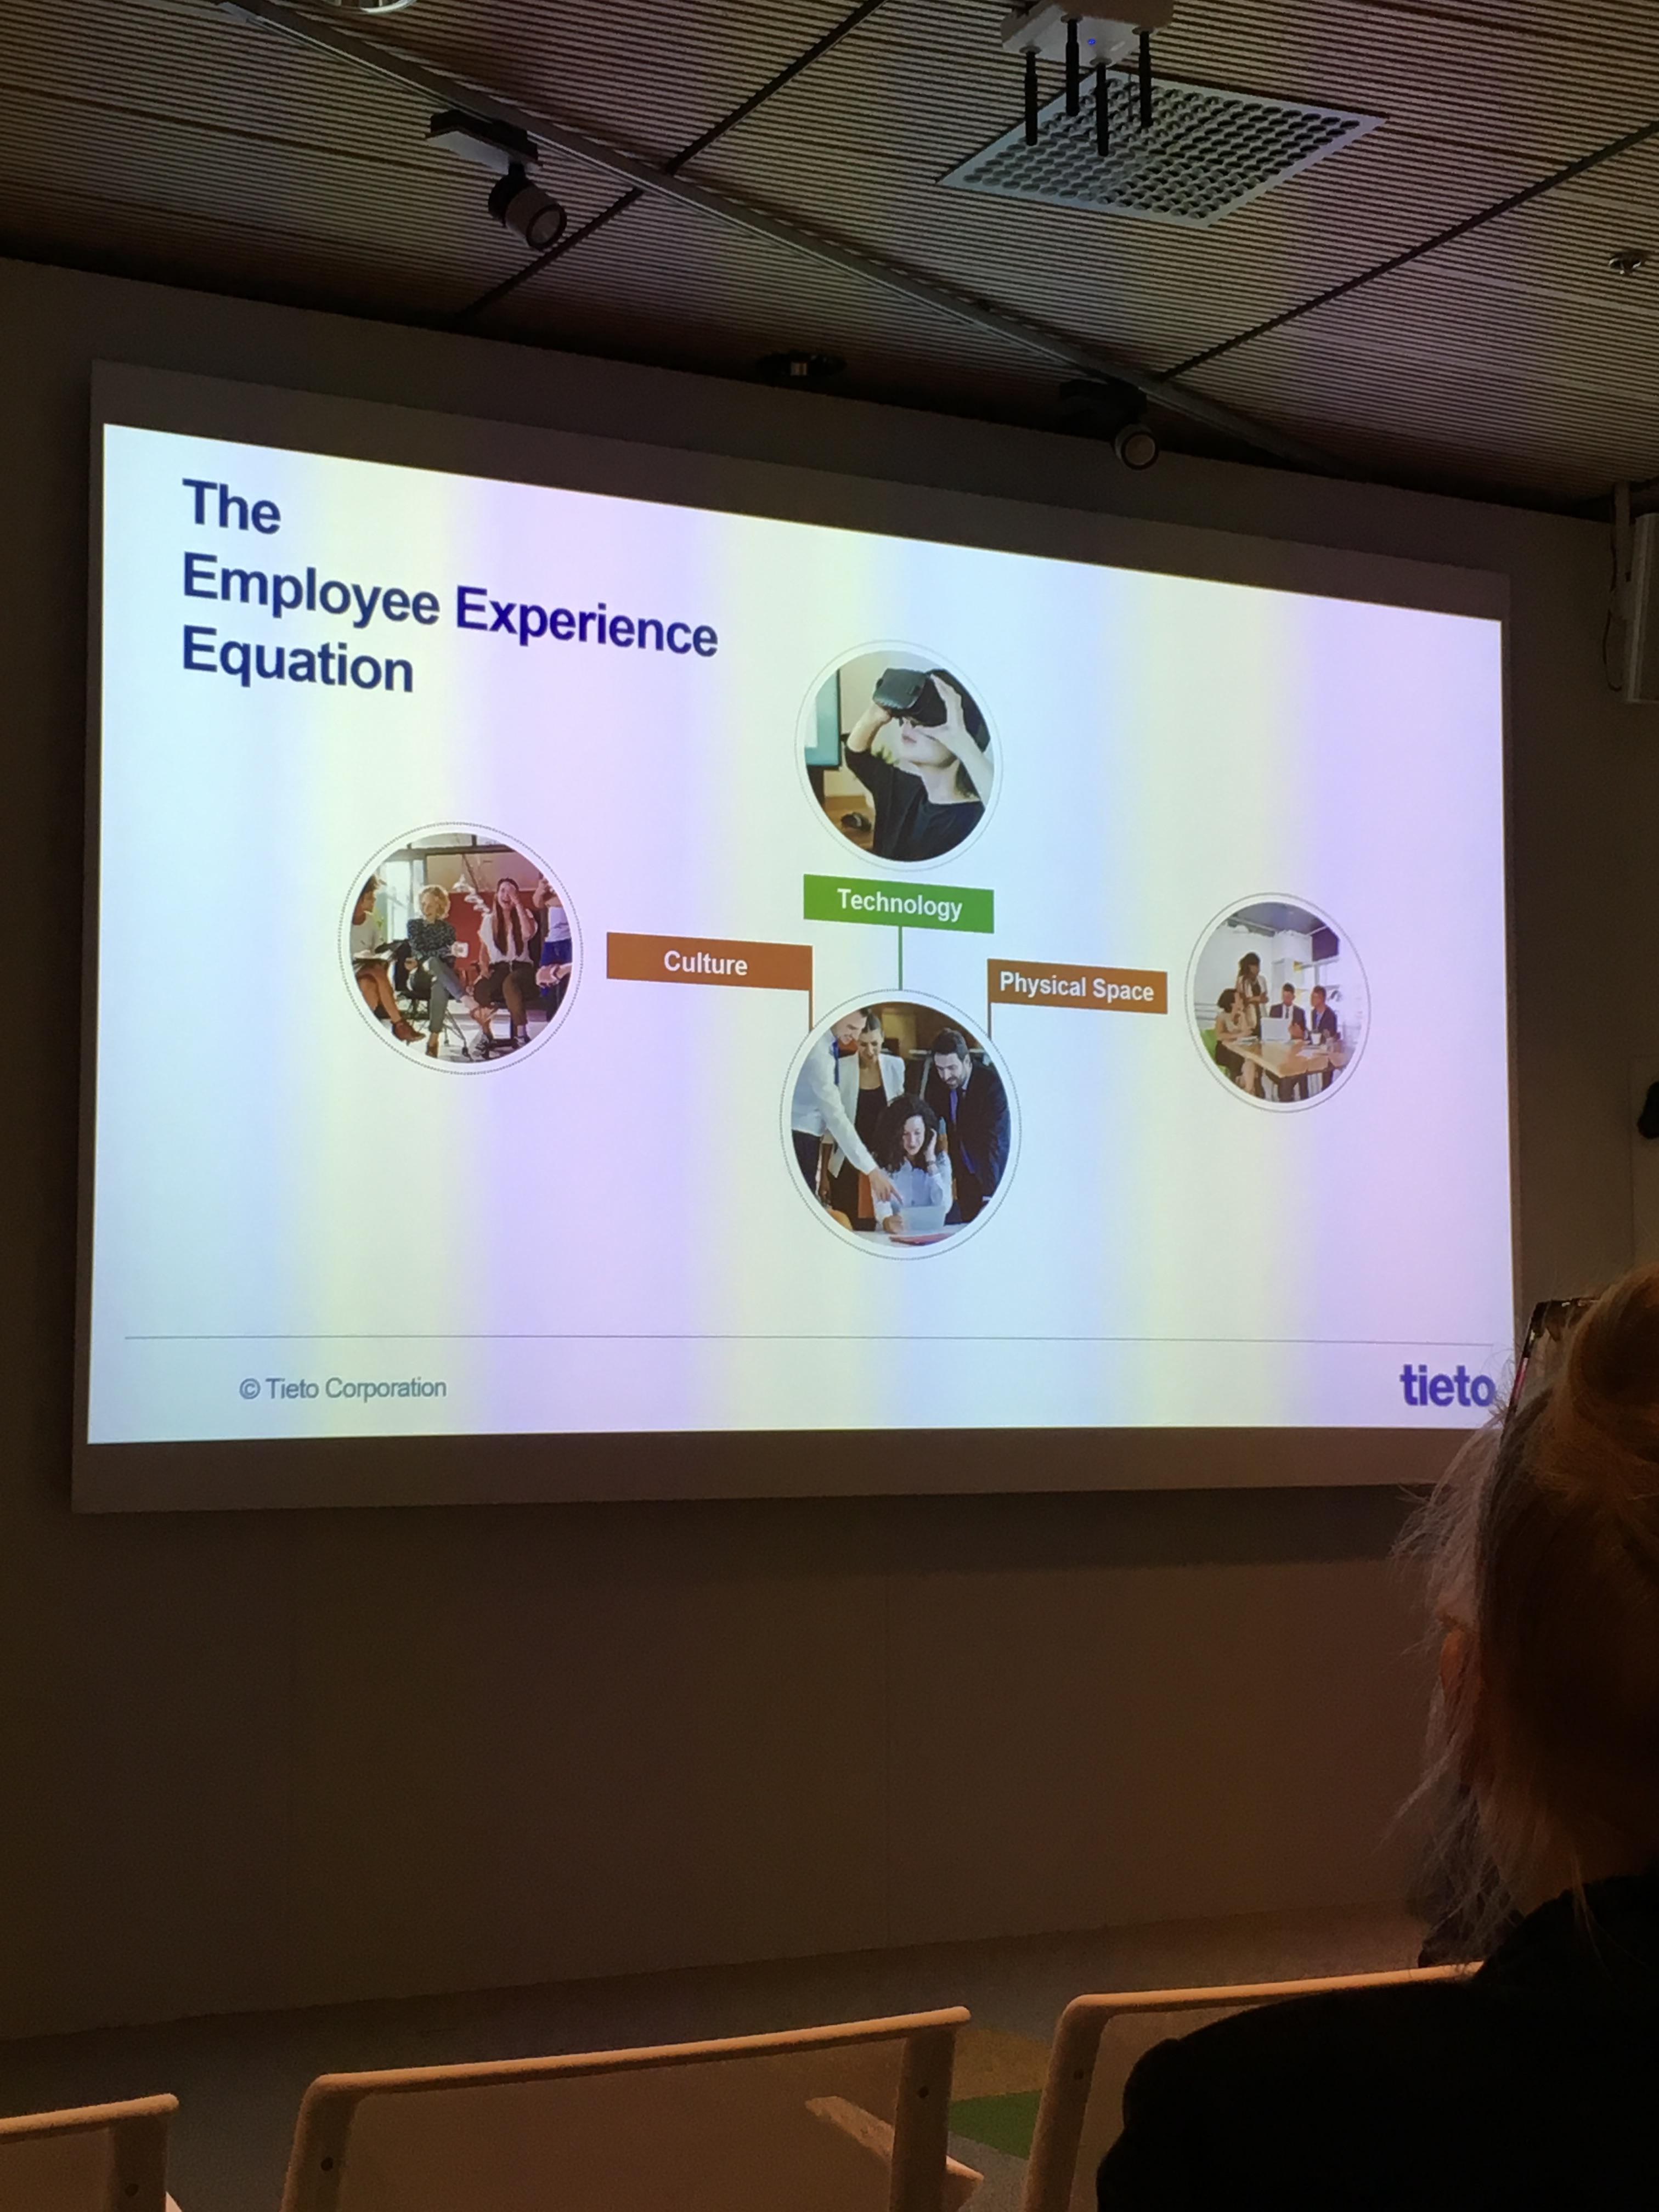 Tieto_employee_experience_1